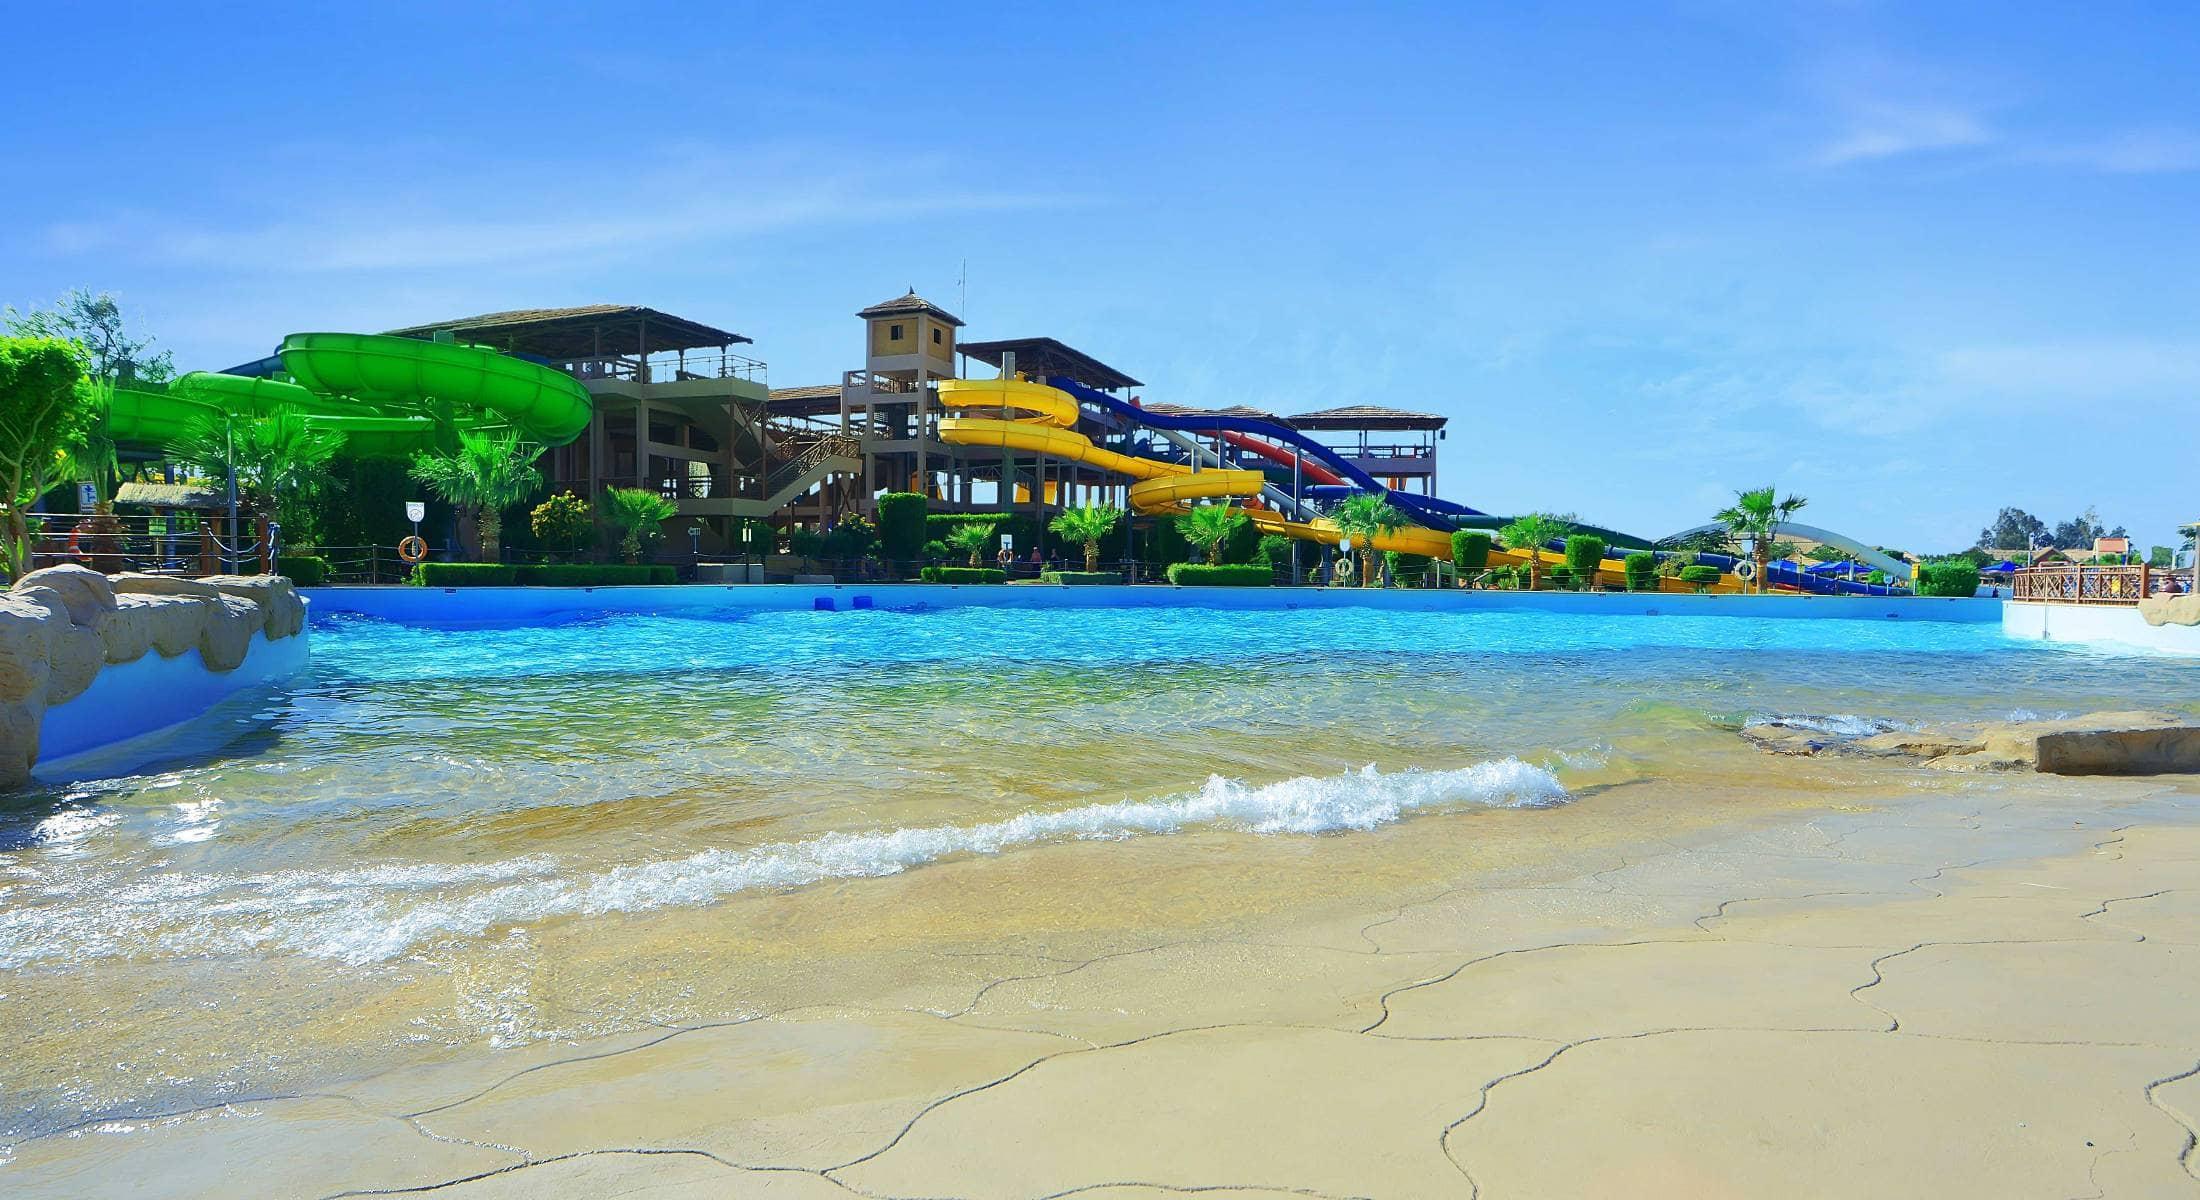 dovolenka Egypt, Hurghada - Jungle Aqua Park